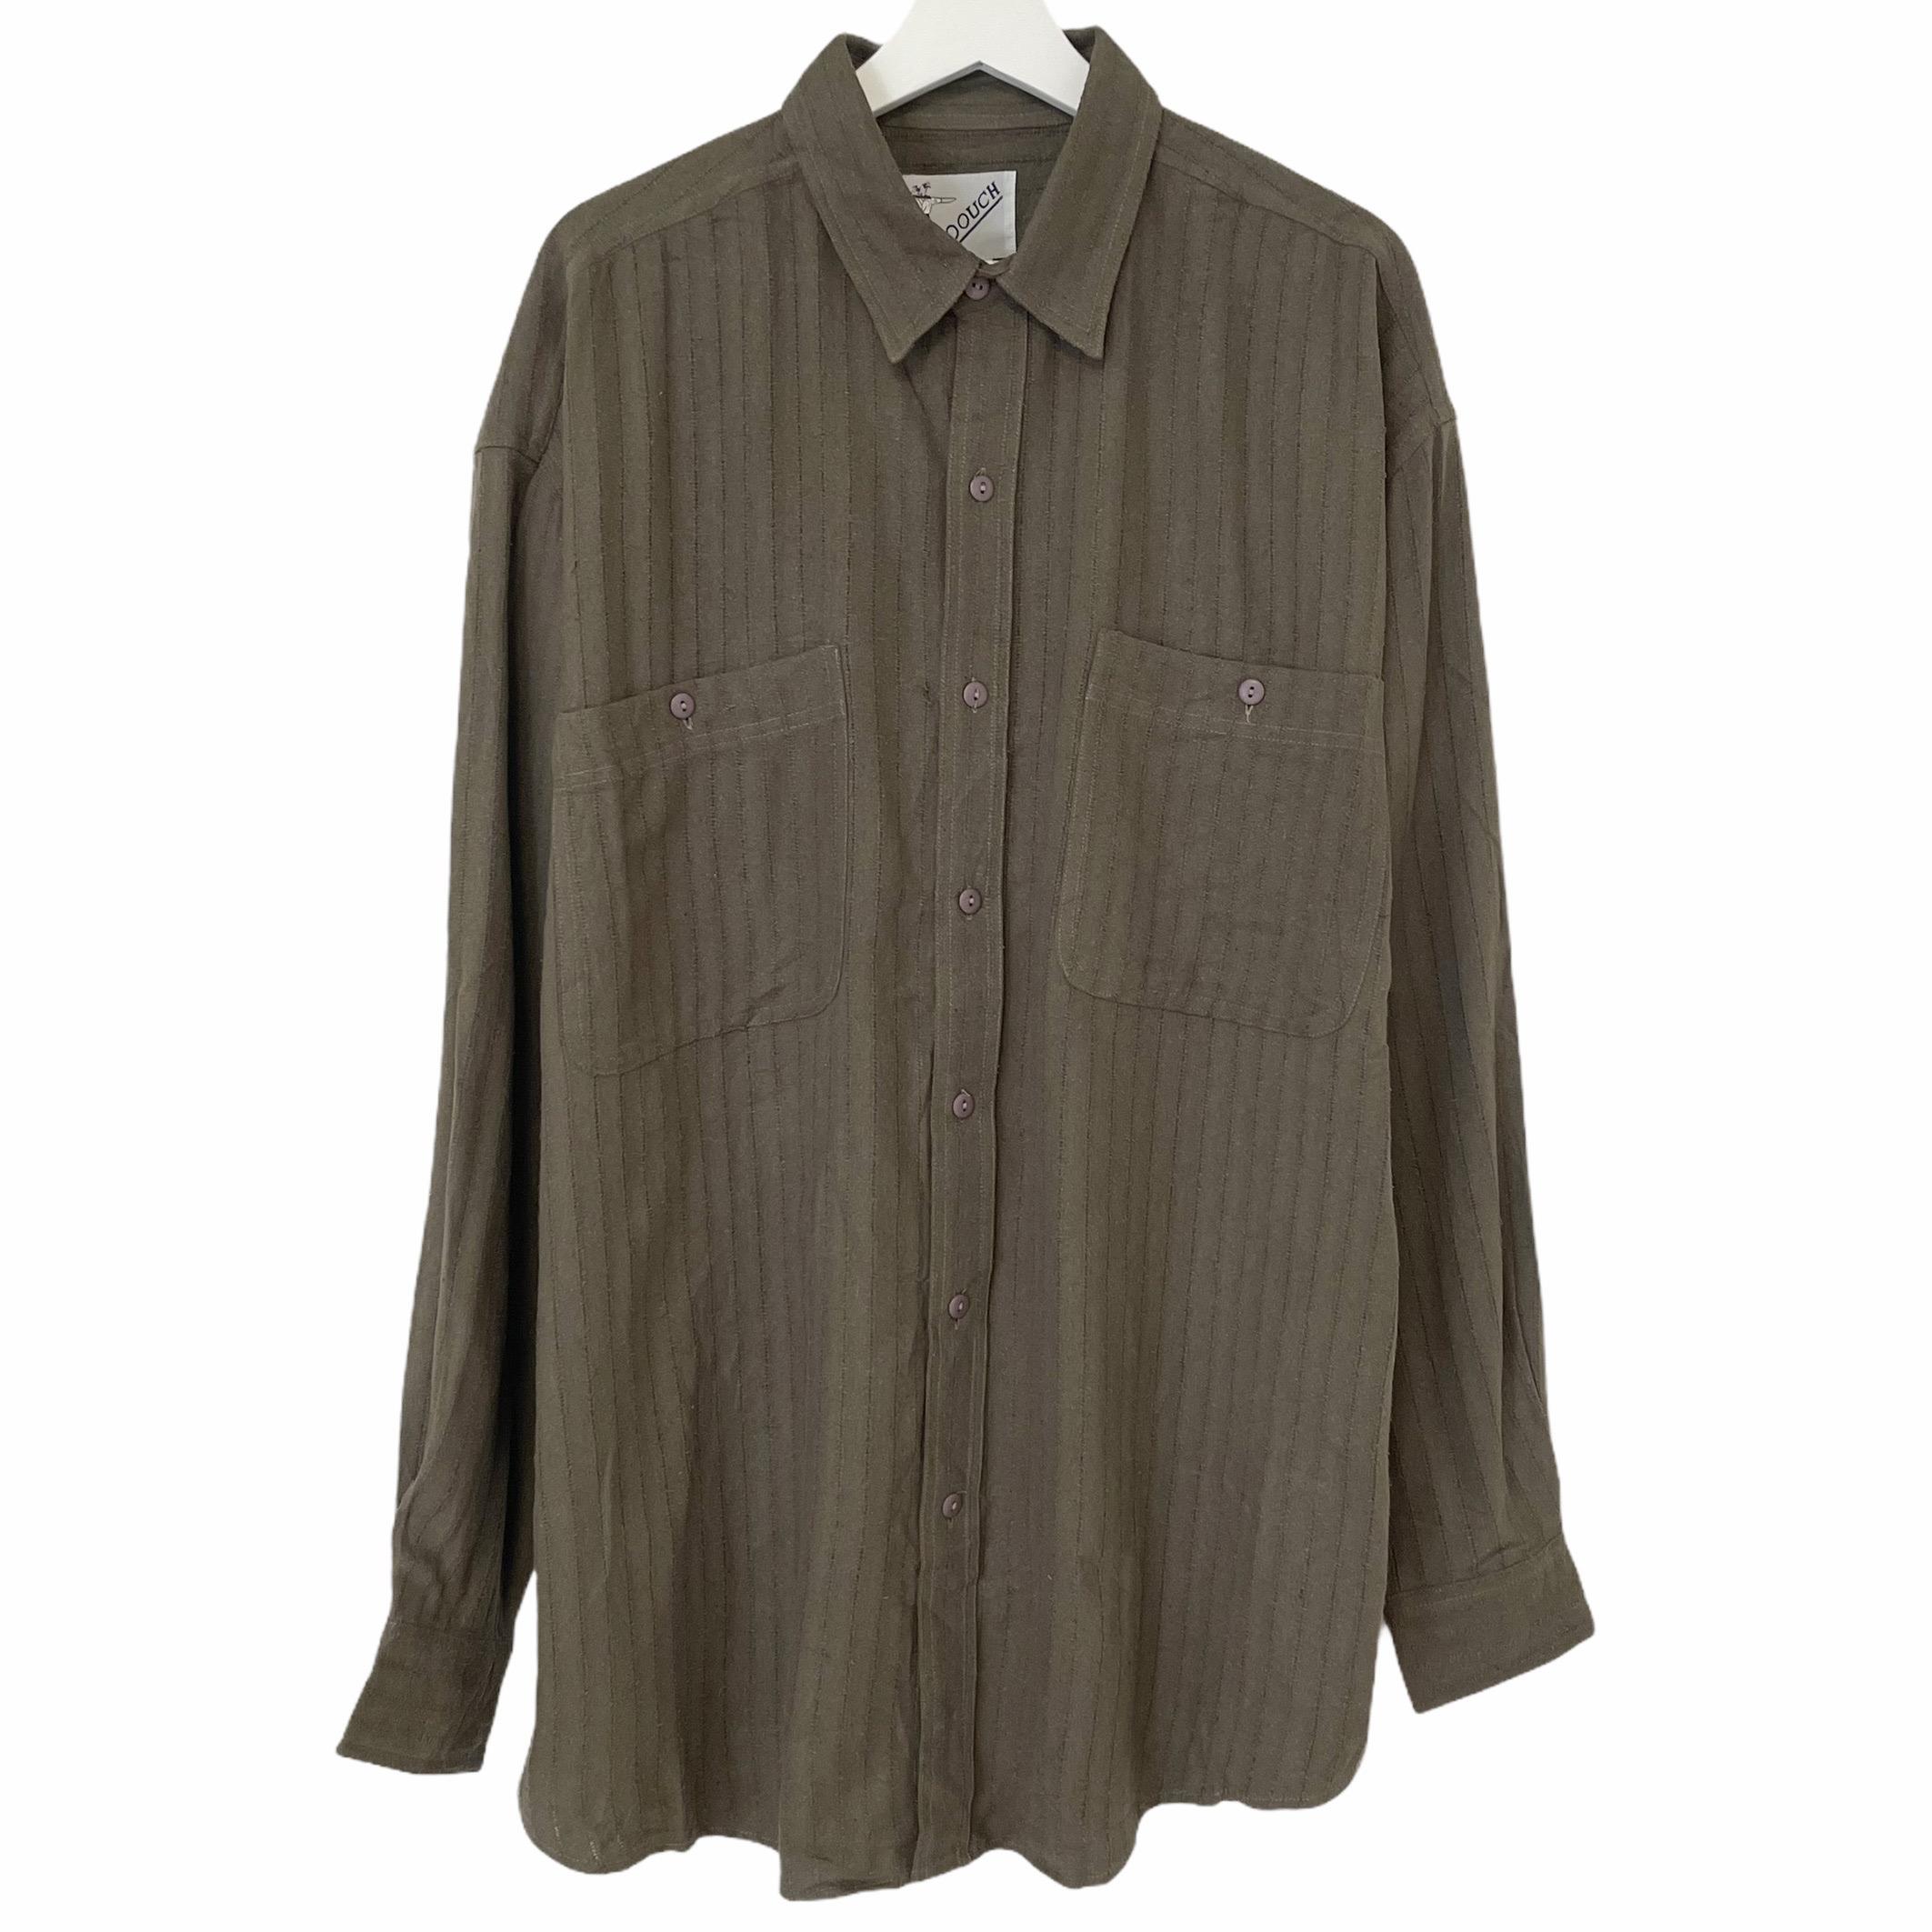 Dead Stock 海外 90's GOOUCH 店内全品対象 Silk Shirt カーキ シャツ グーチ シルク デッドストック KHAKI